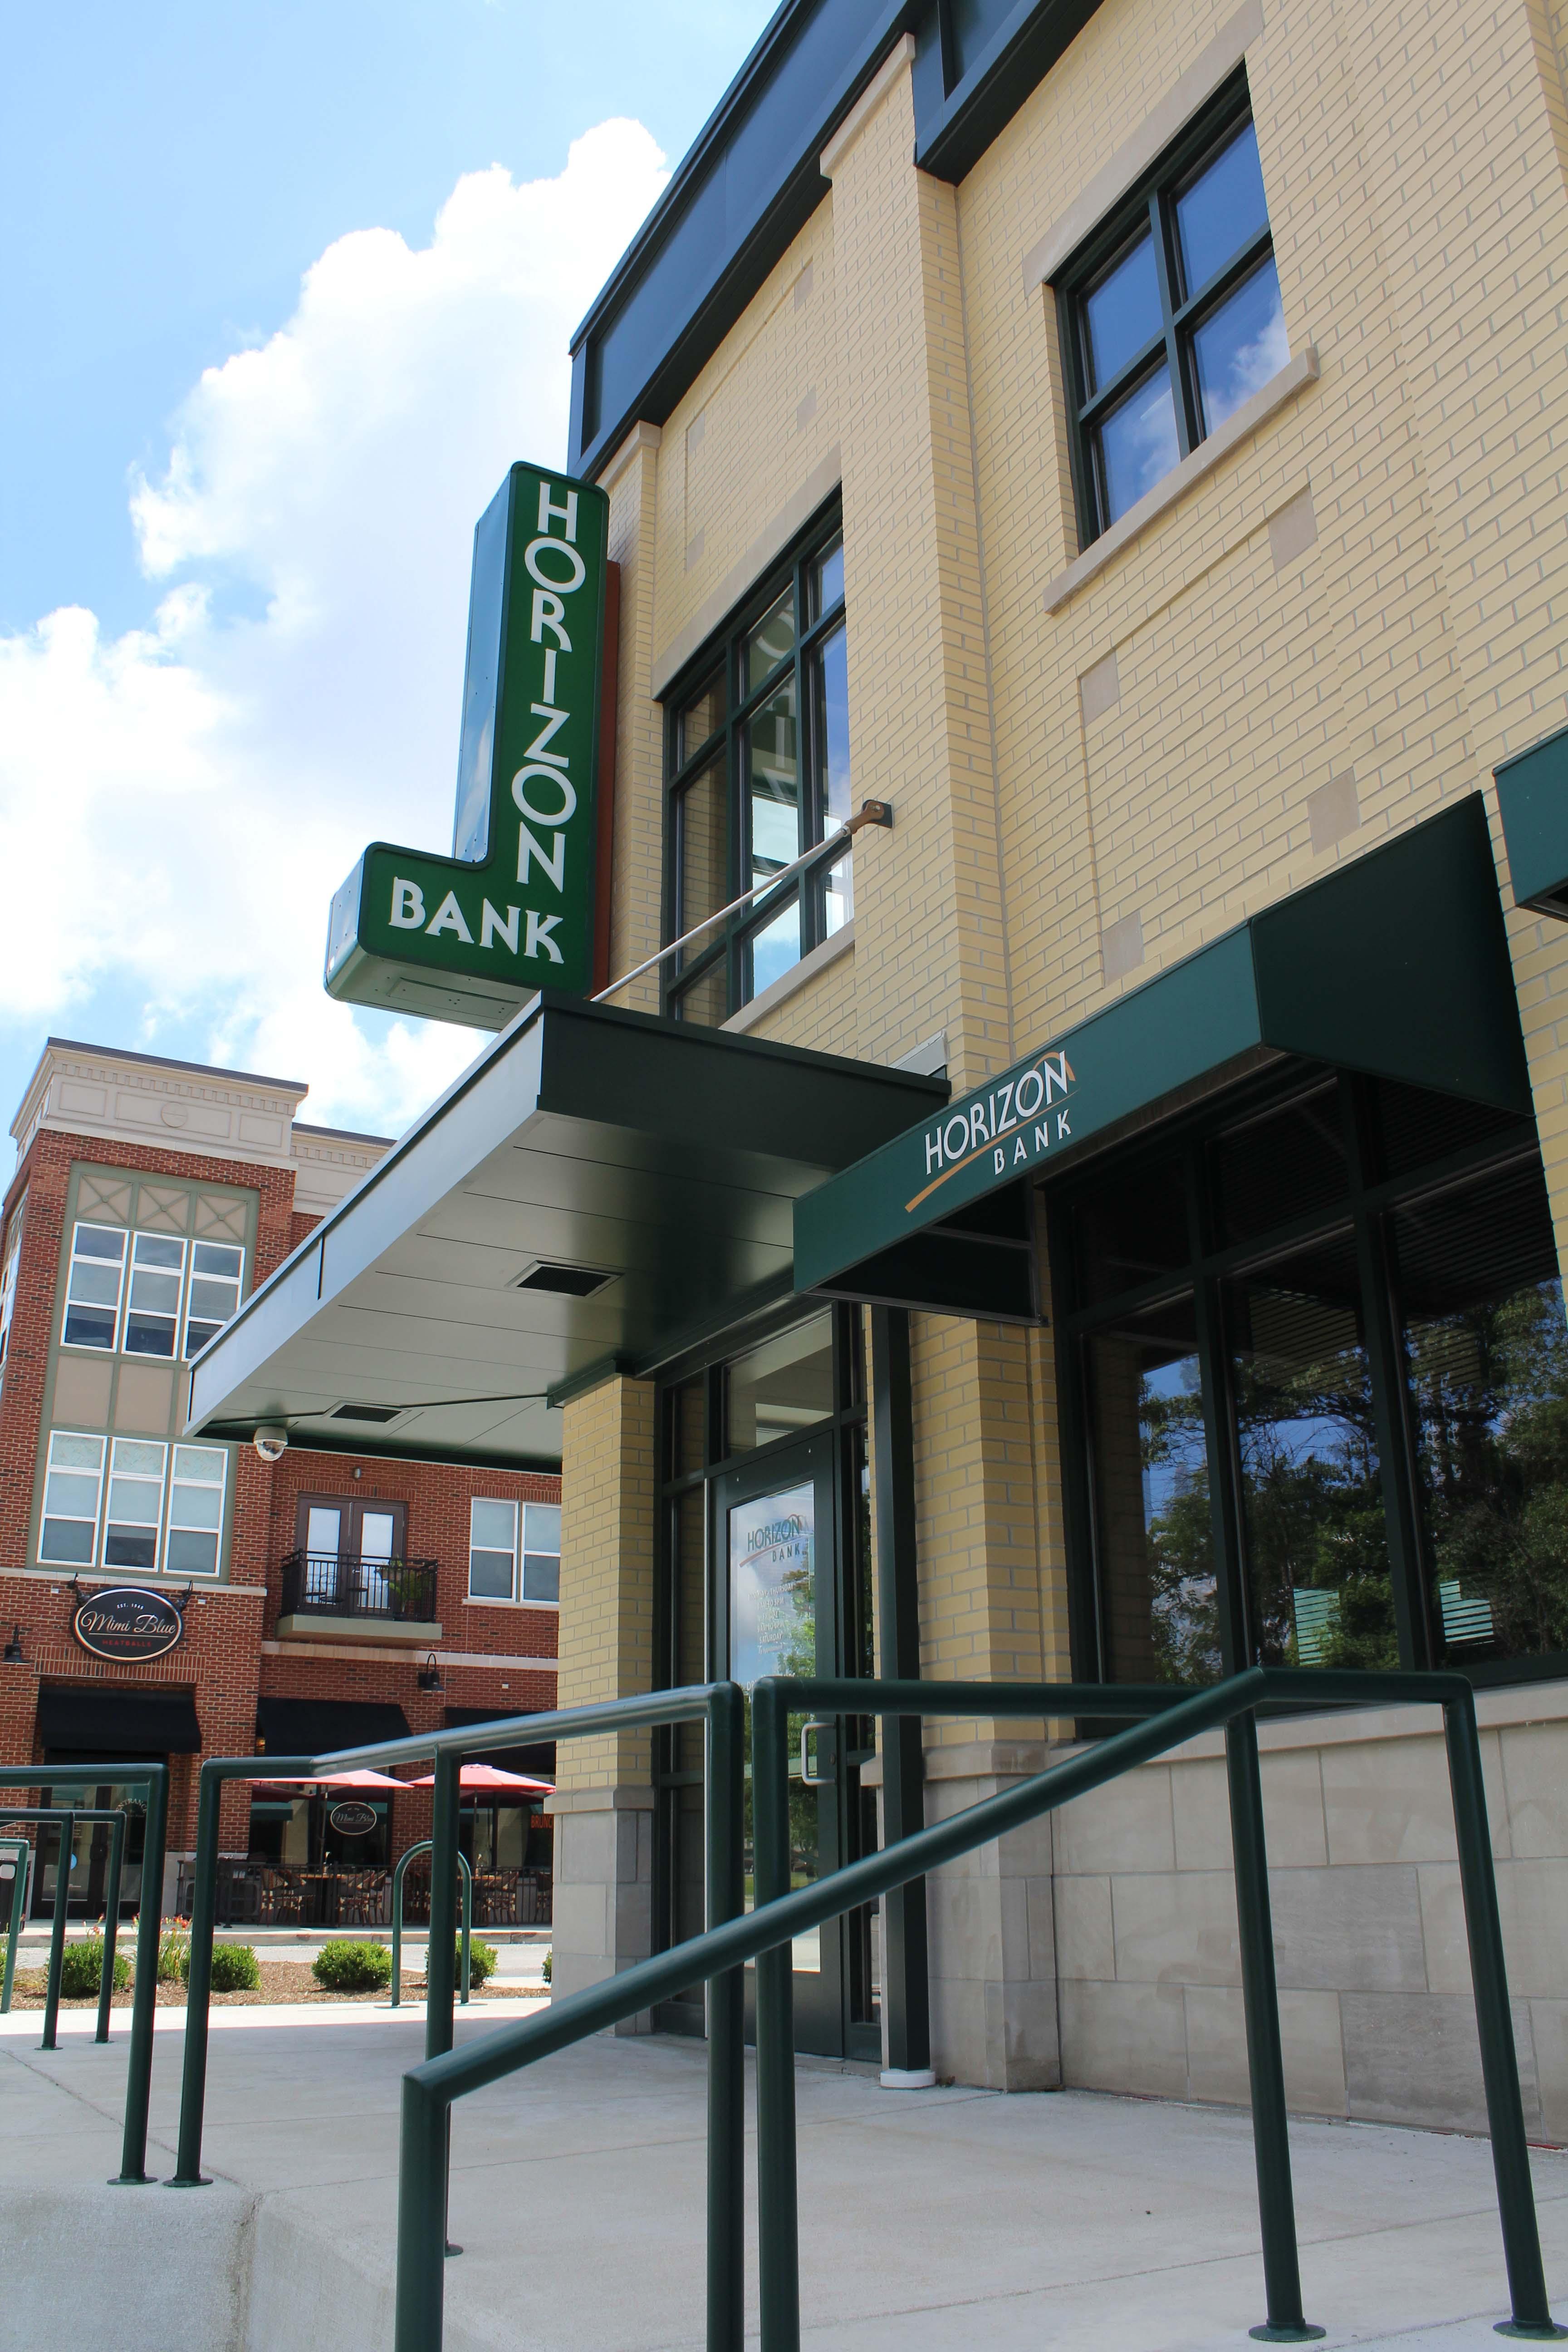 Horizon Bank Carmel exterior side sidewalk